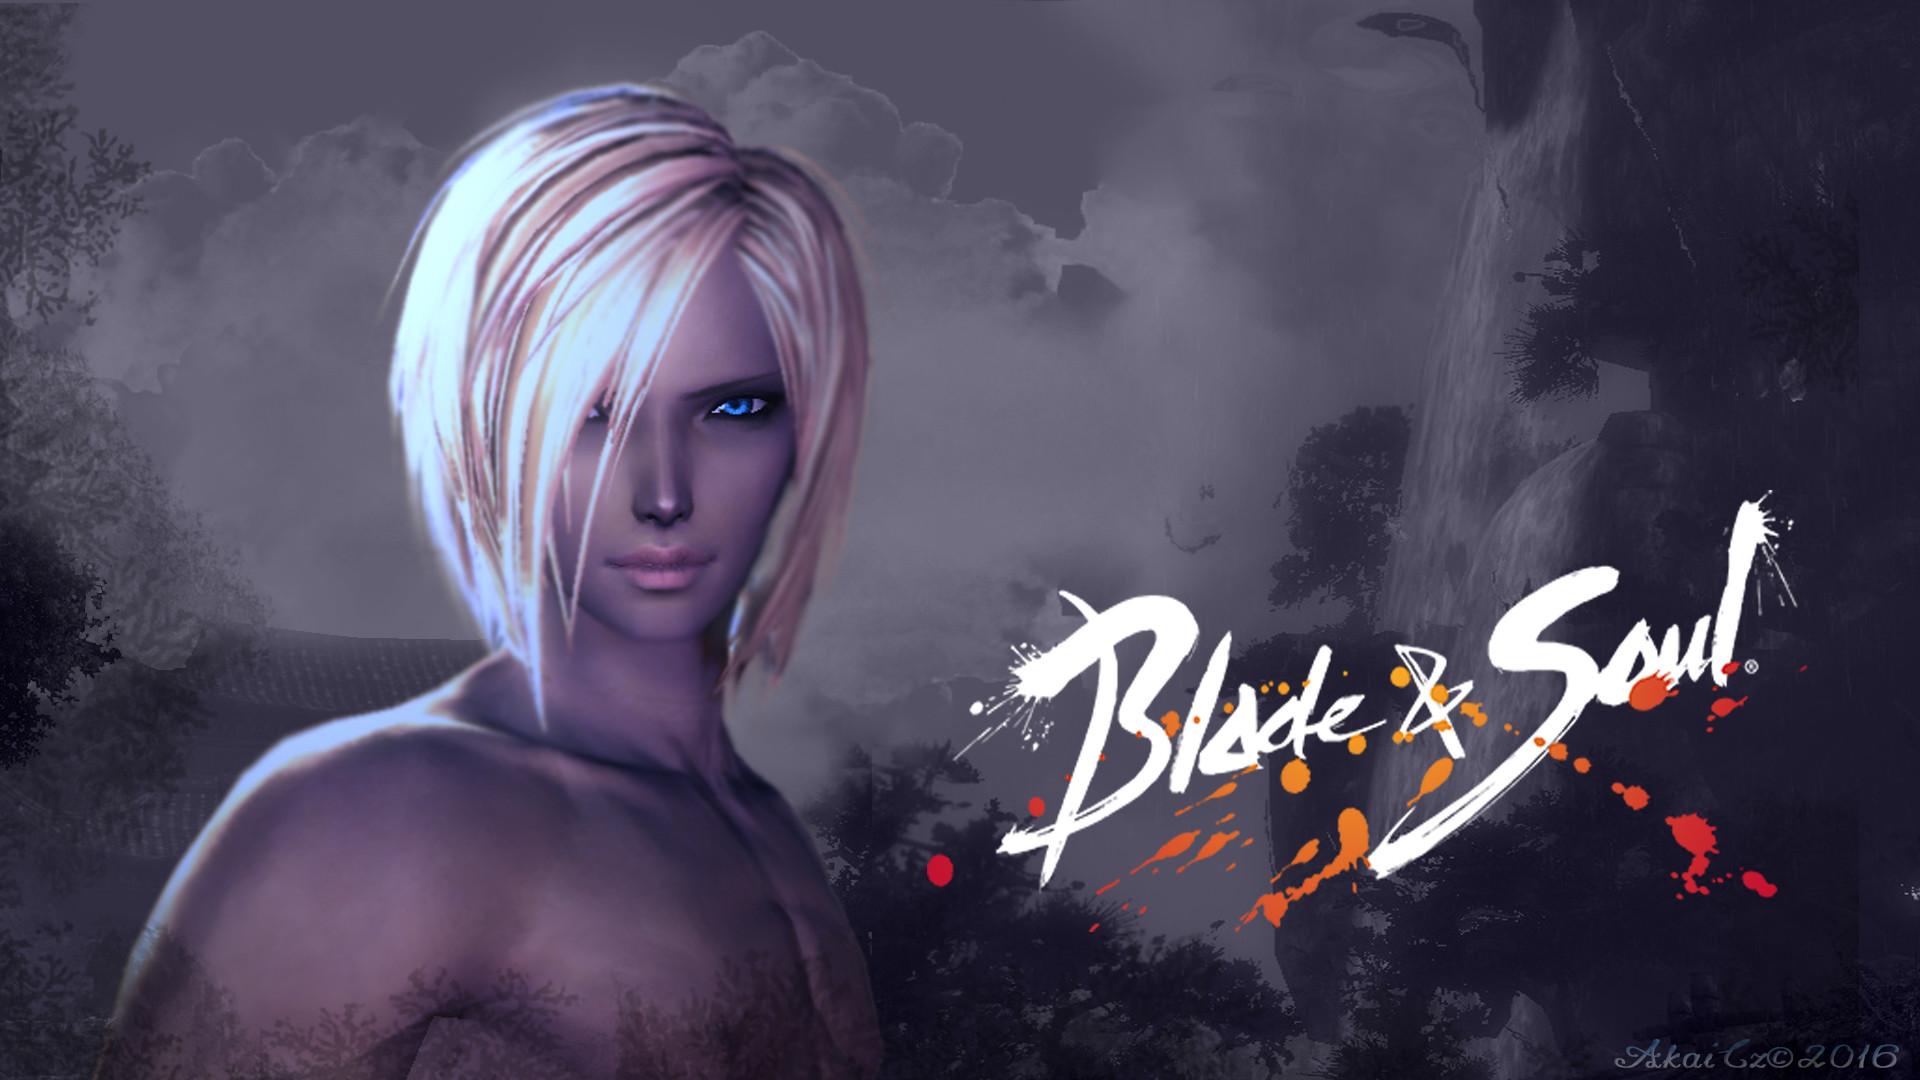 blade and soul_akaicz_2016_002